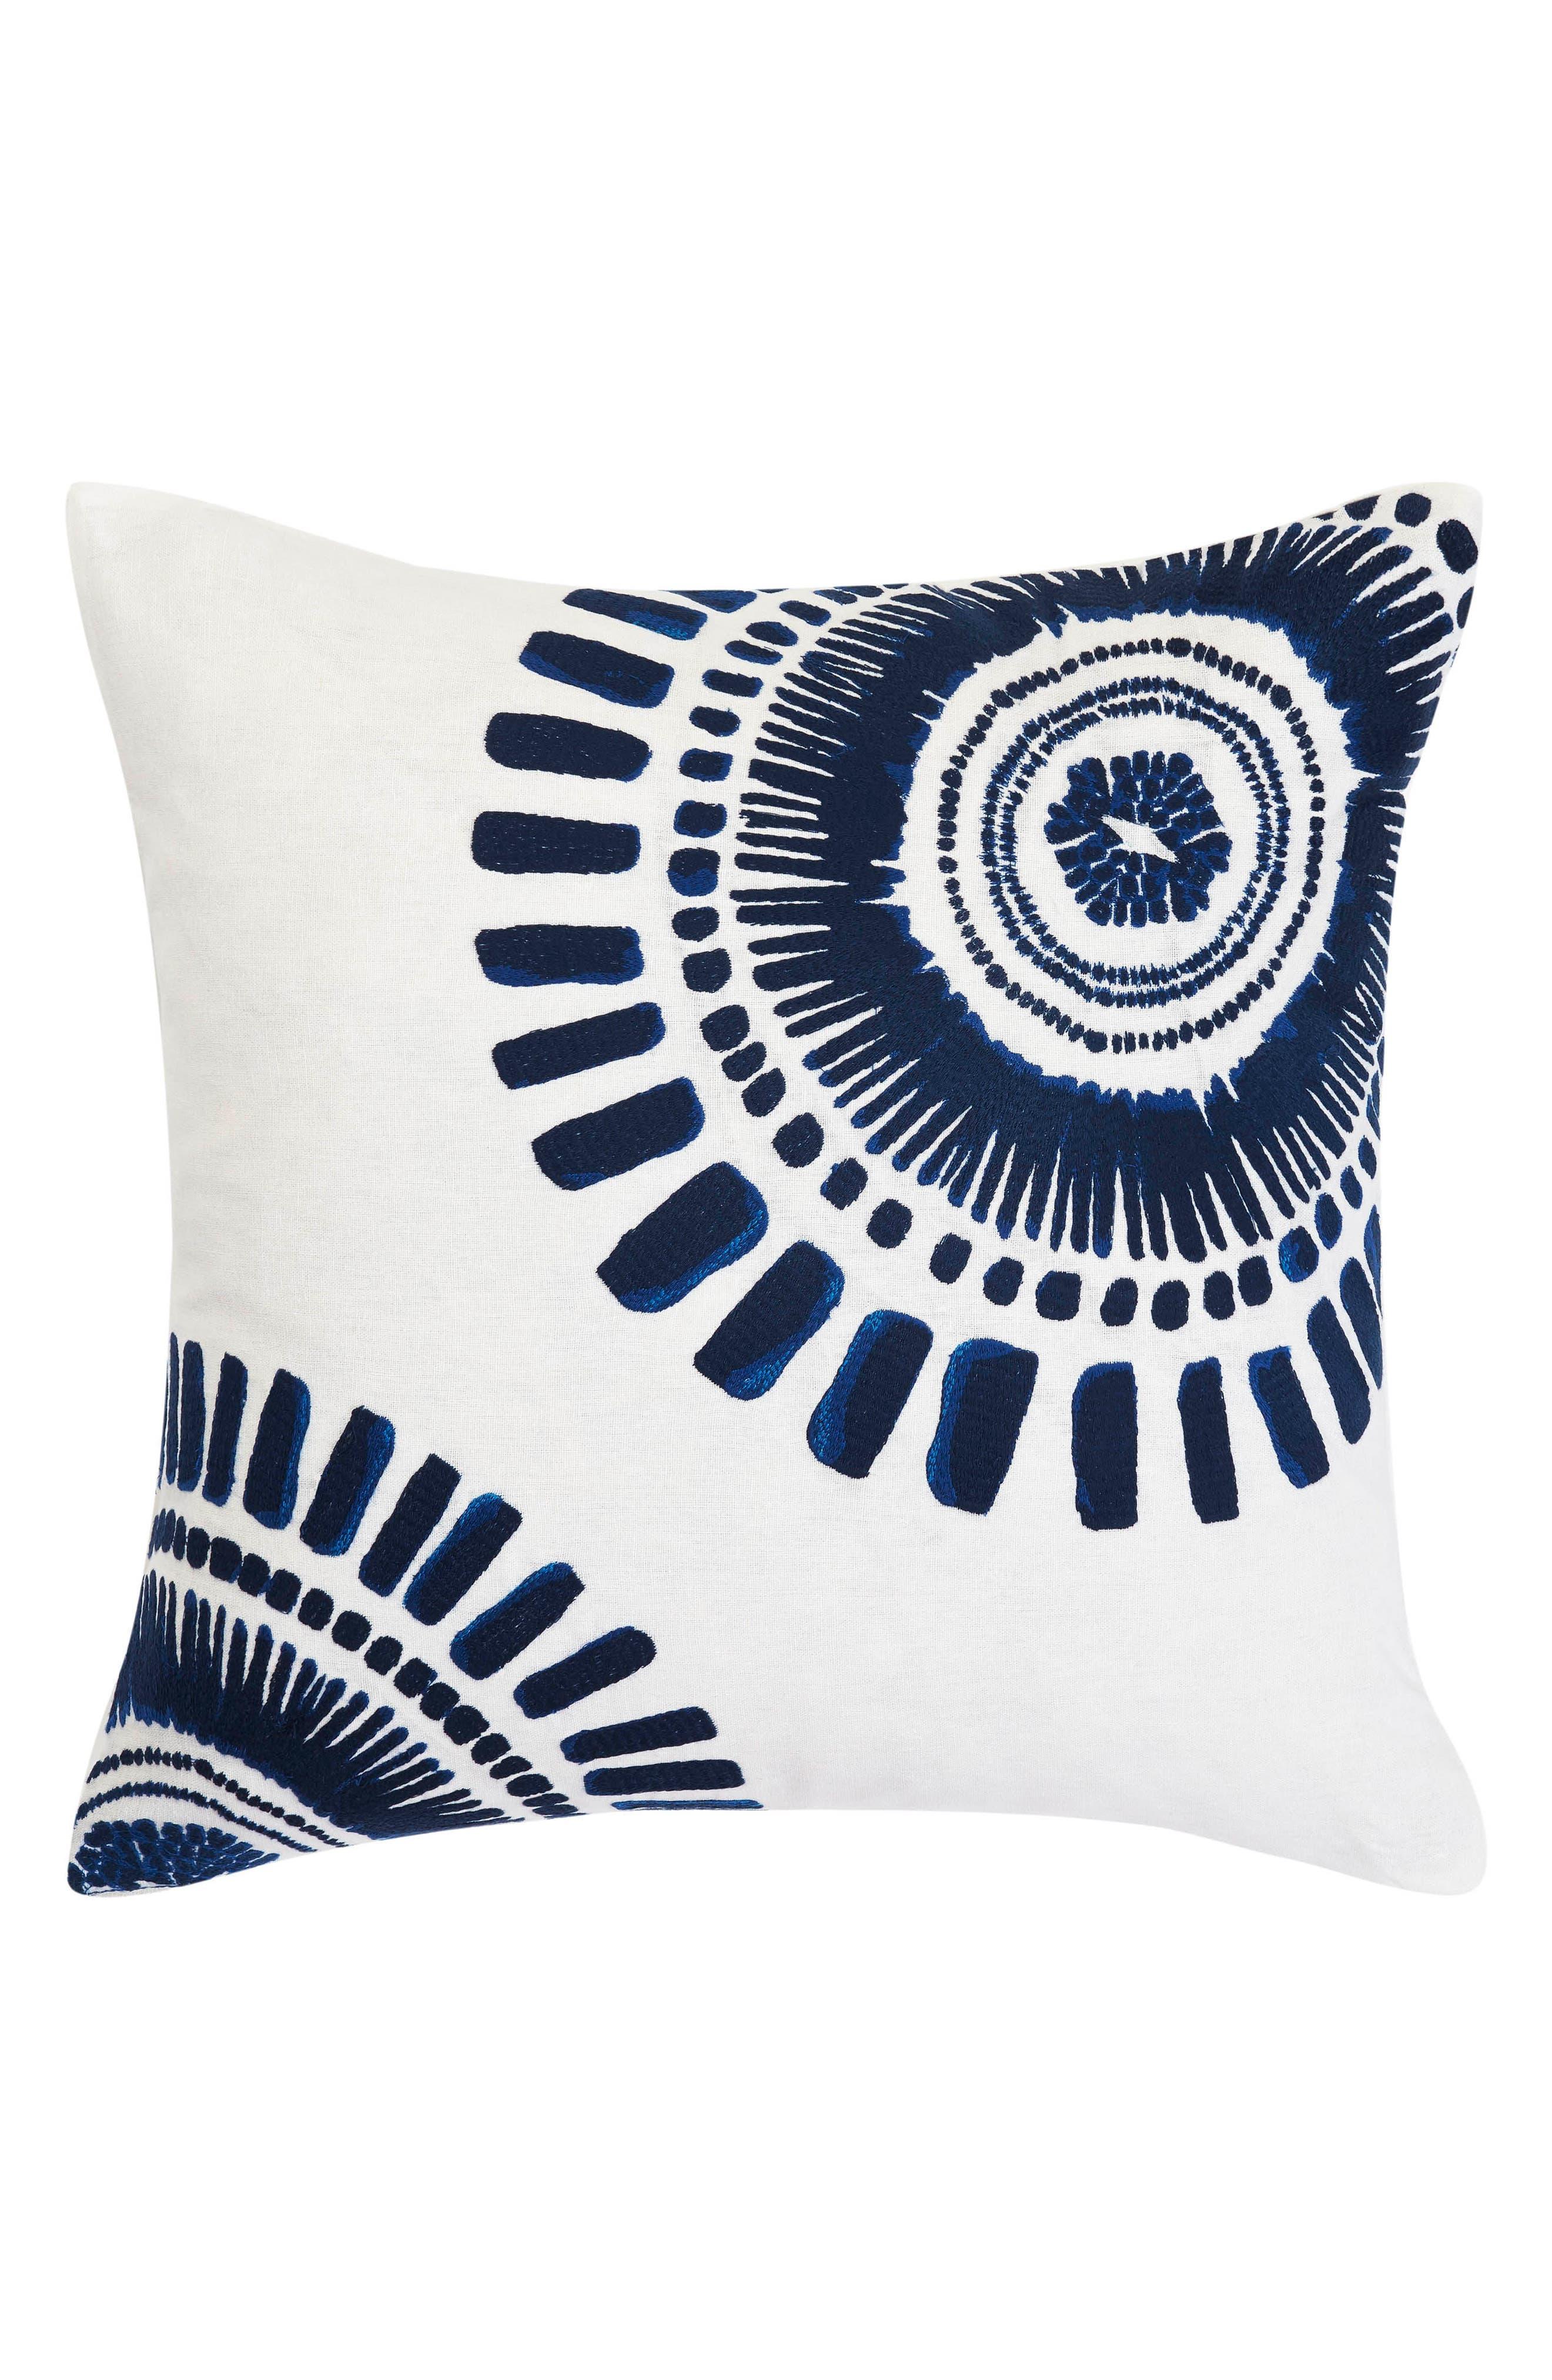 Main Image - Trina Turk Samba de Roda Accent Pillow